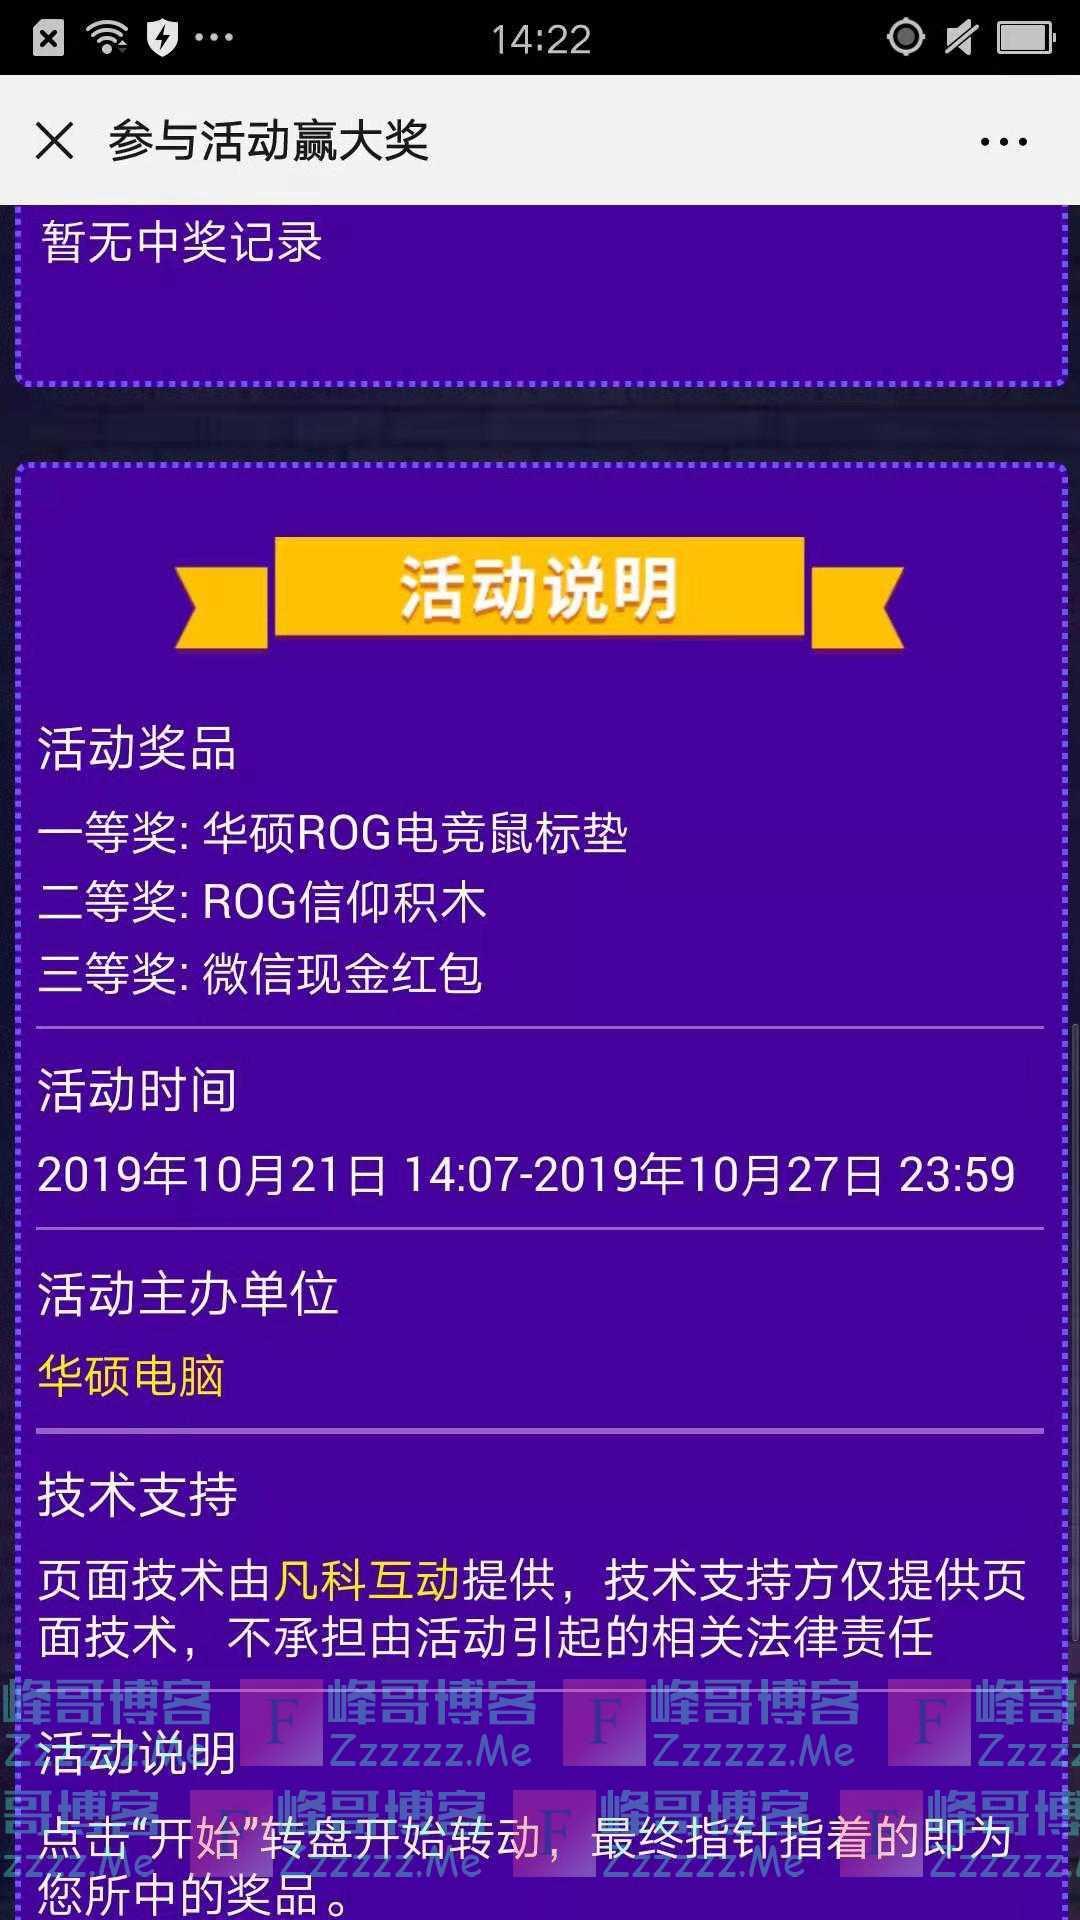 ASUS华硕东北双十一转转转(截止10月27日)